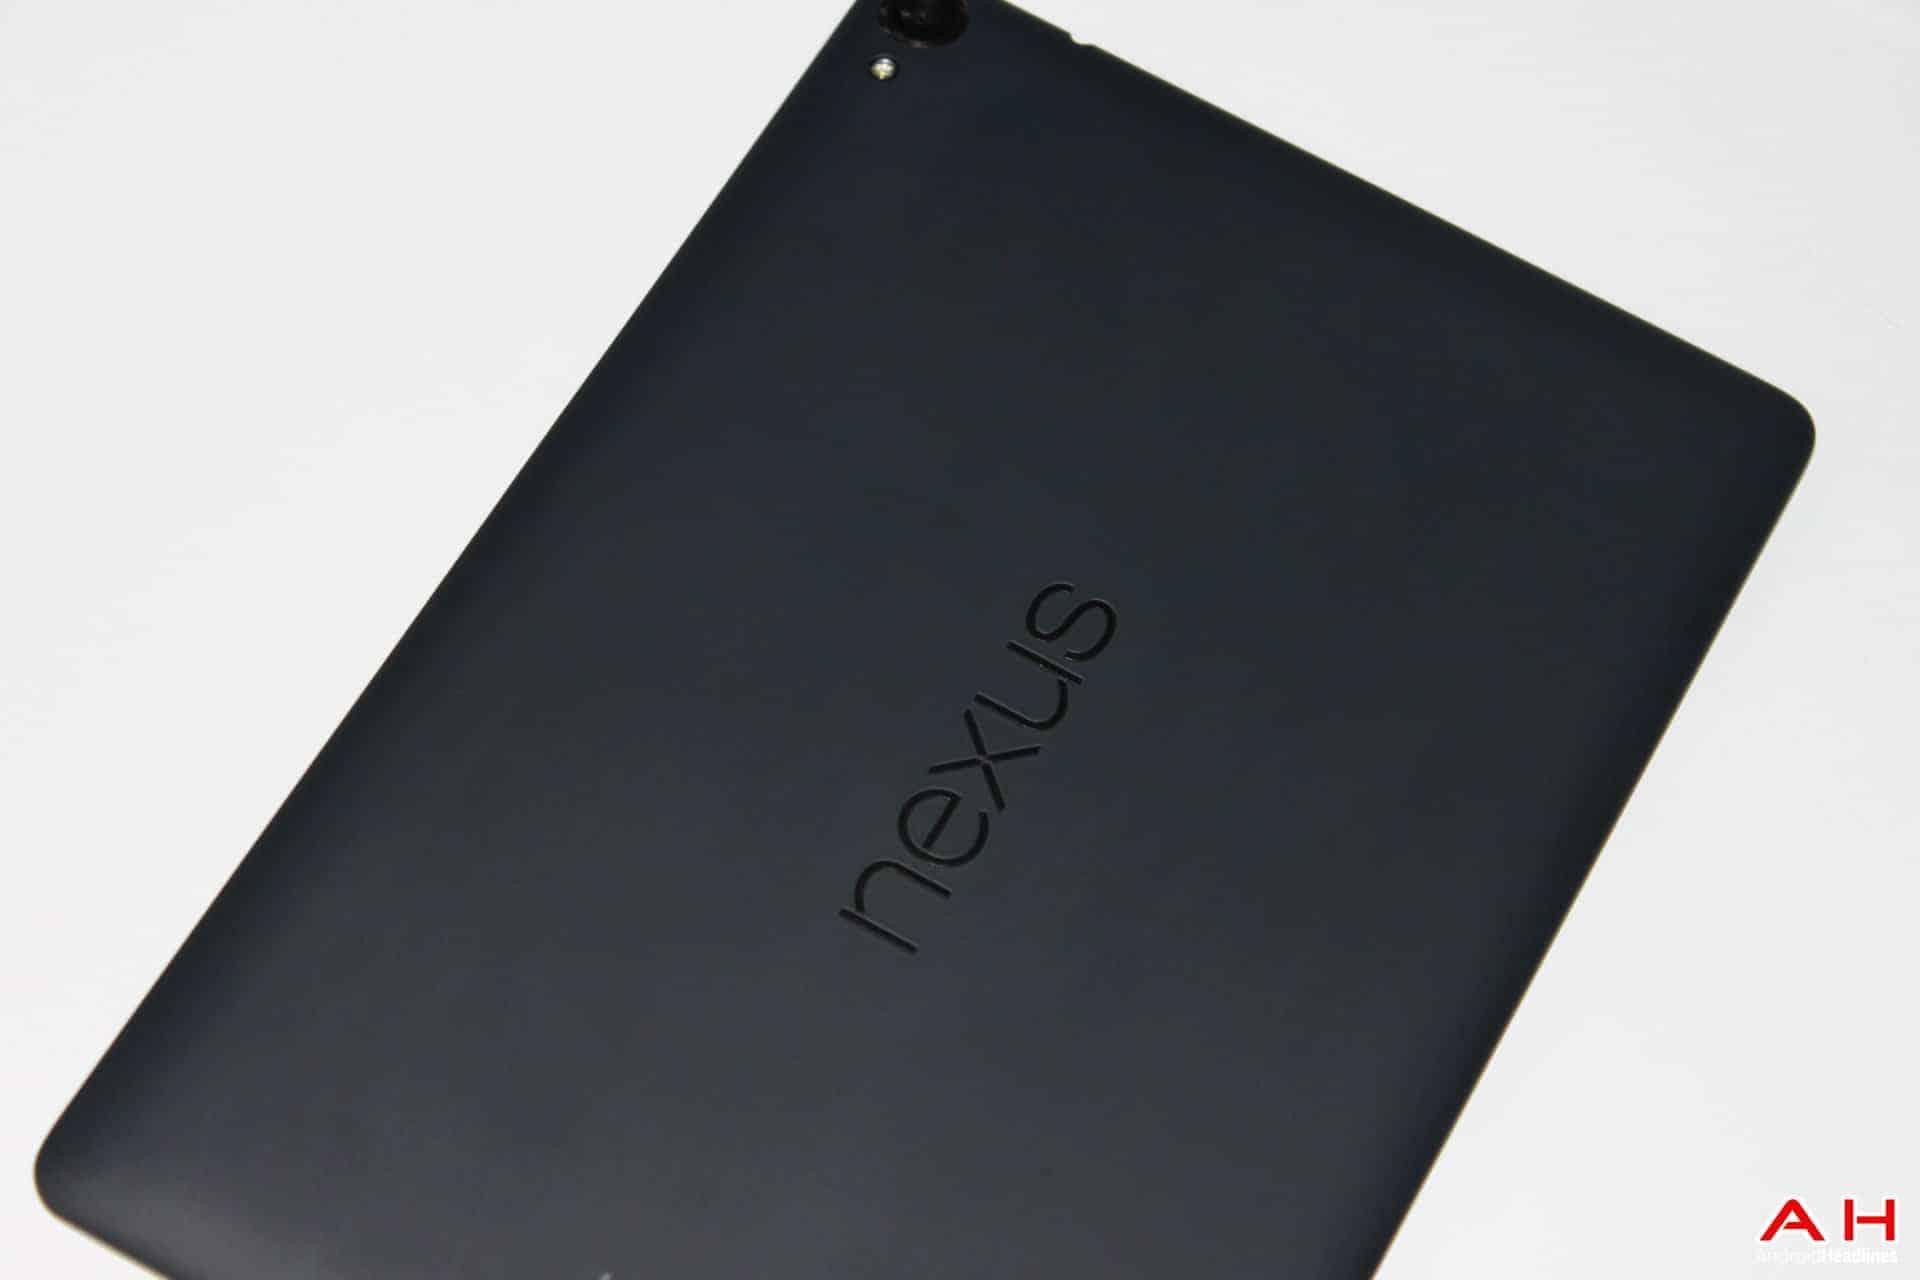 AH Nexus 9 logo 2 Chris 38